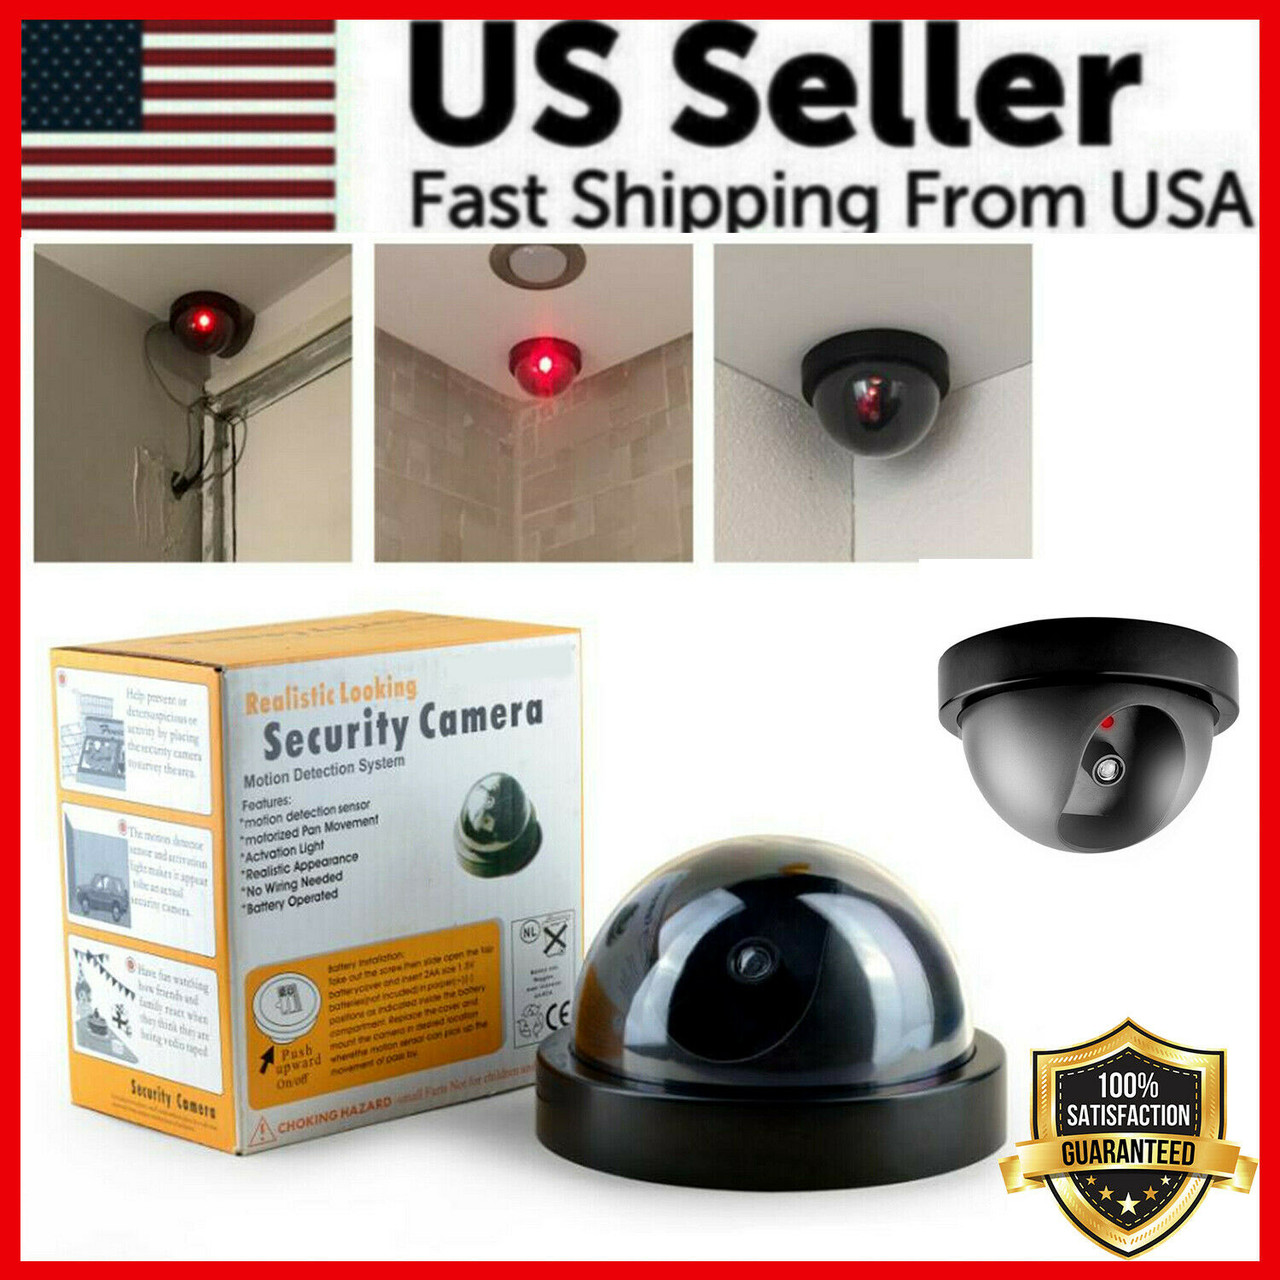 1-10PCS Dummy Camera Fake Security CCTV Dome Camera with Flashing Red LED Light